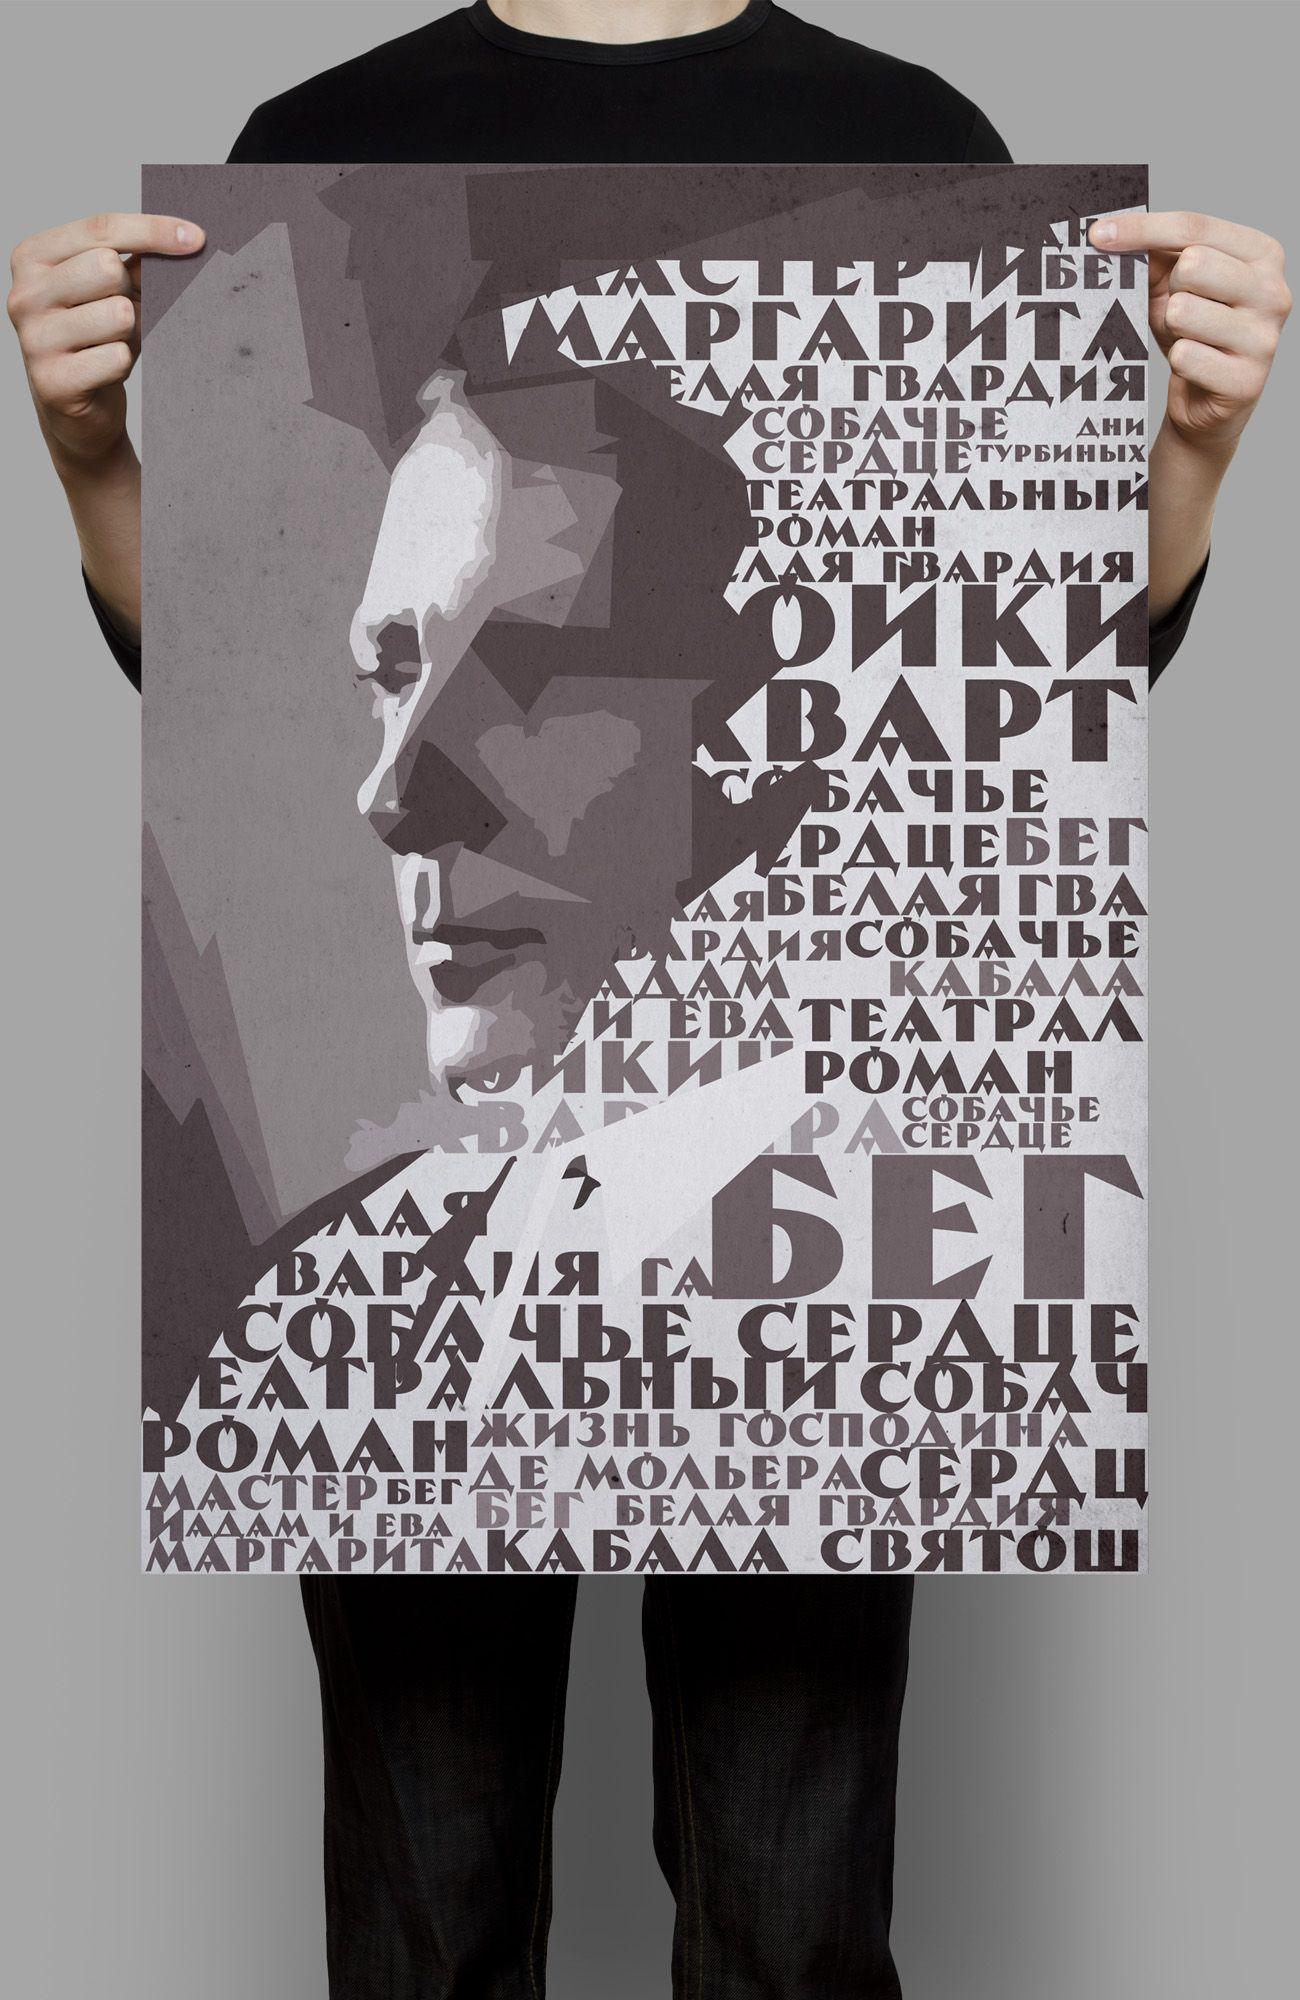 Плакат-портрет Михаила Булгакова - дизайнер toster108